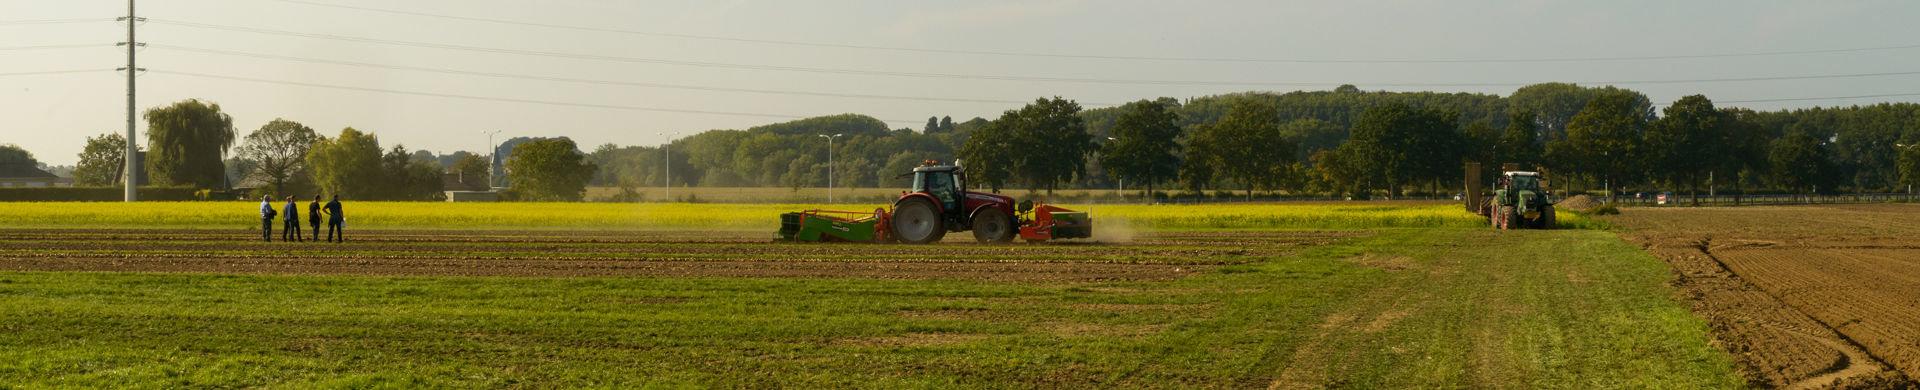 header-landbouw-cc-by-sa-2-0-werktuigendagen-oudenaarde-via-flickr